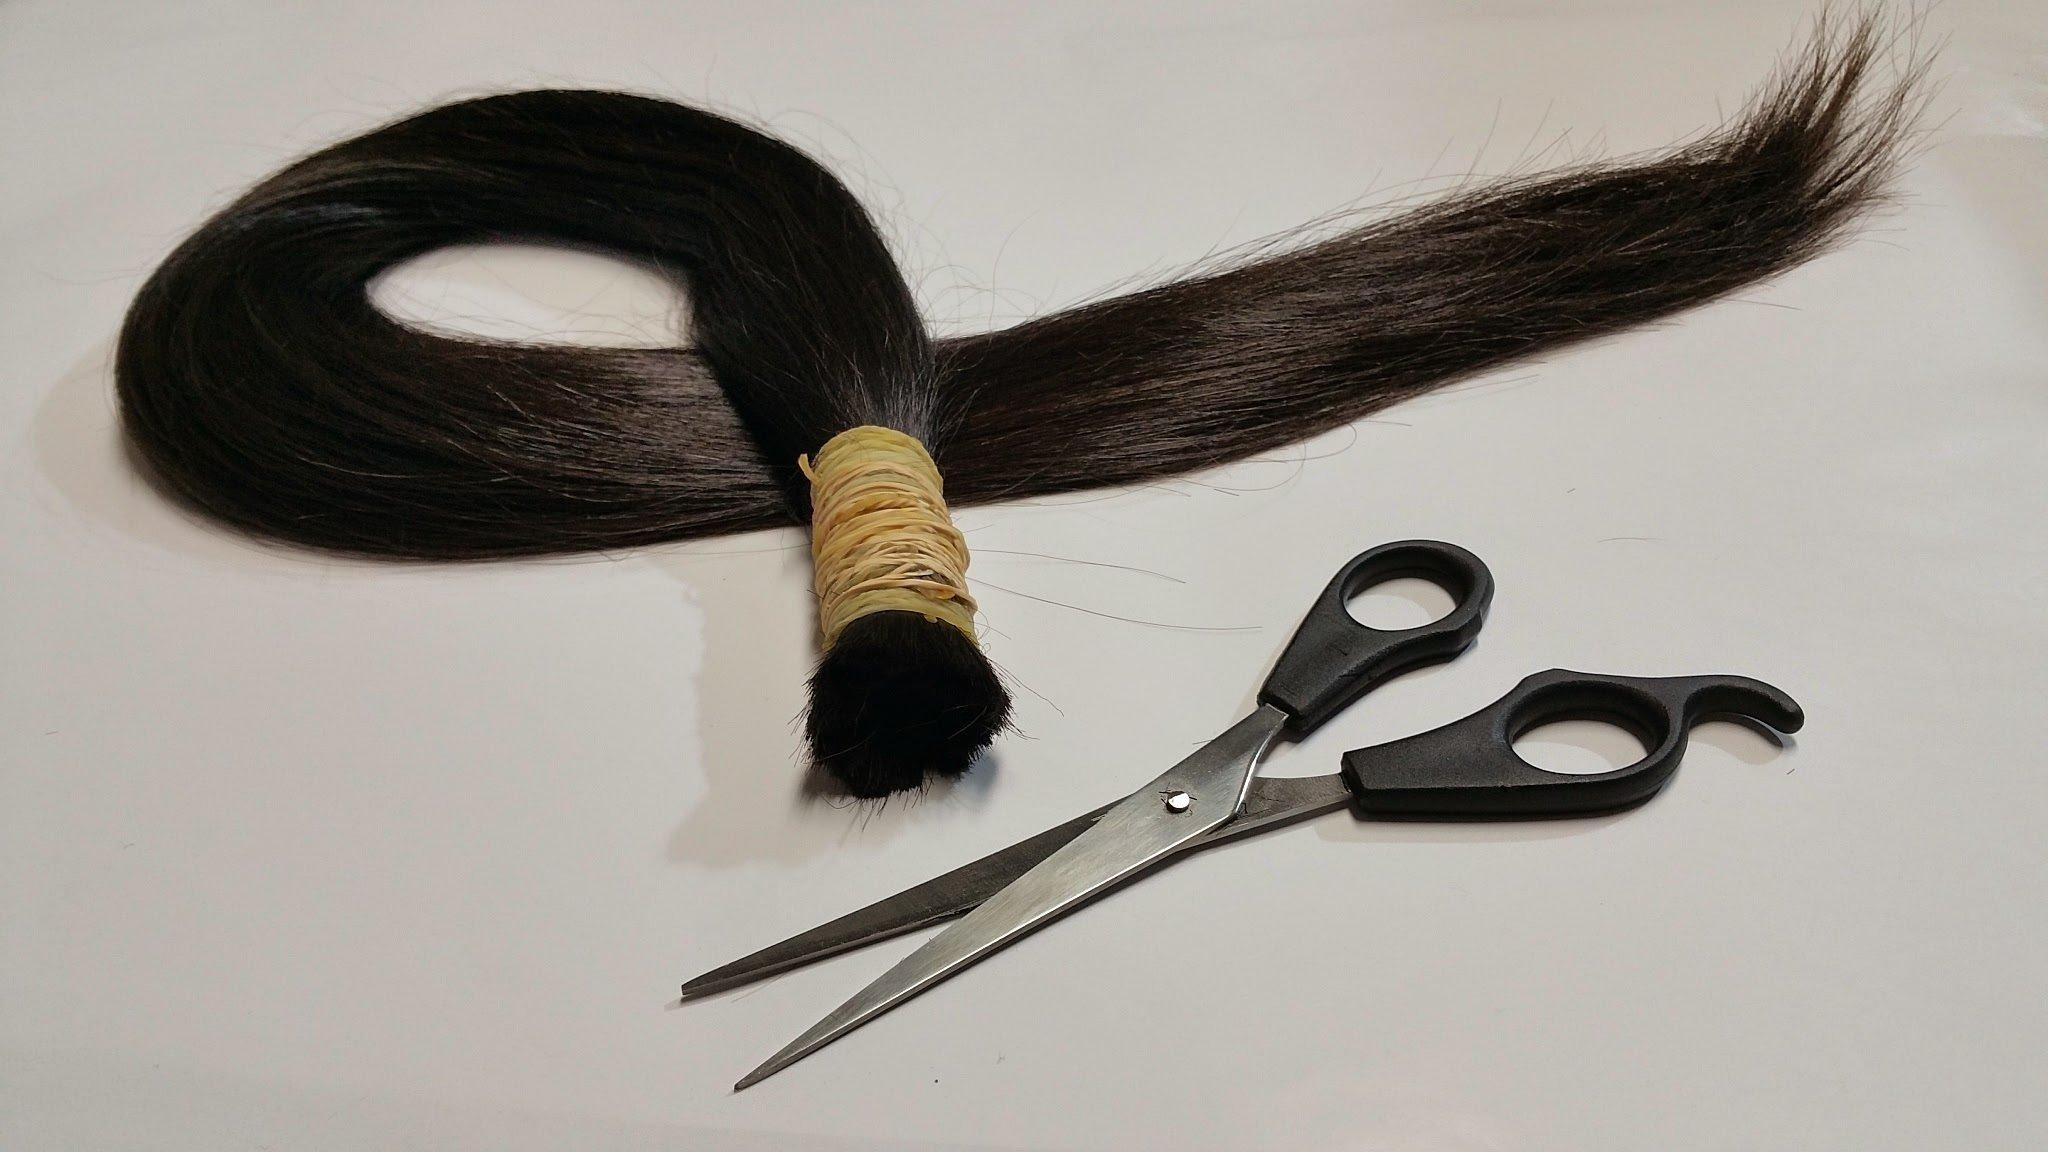 Условия и правила снятия приворотов на волосы